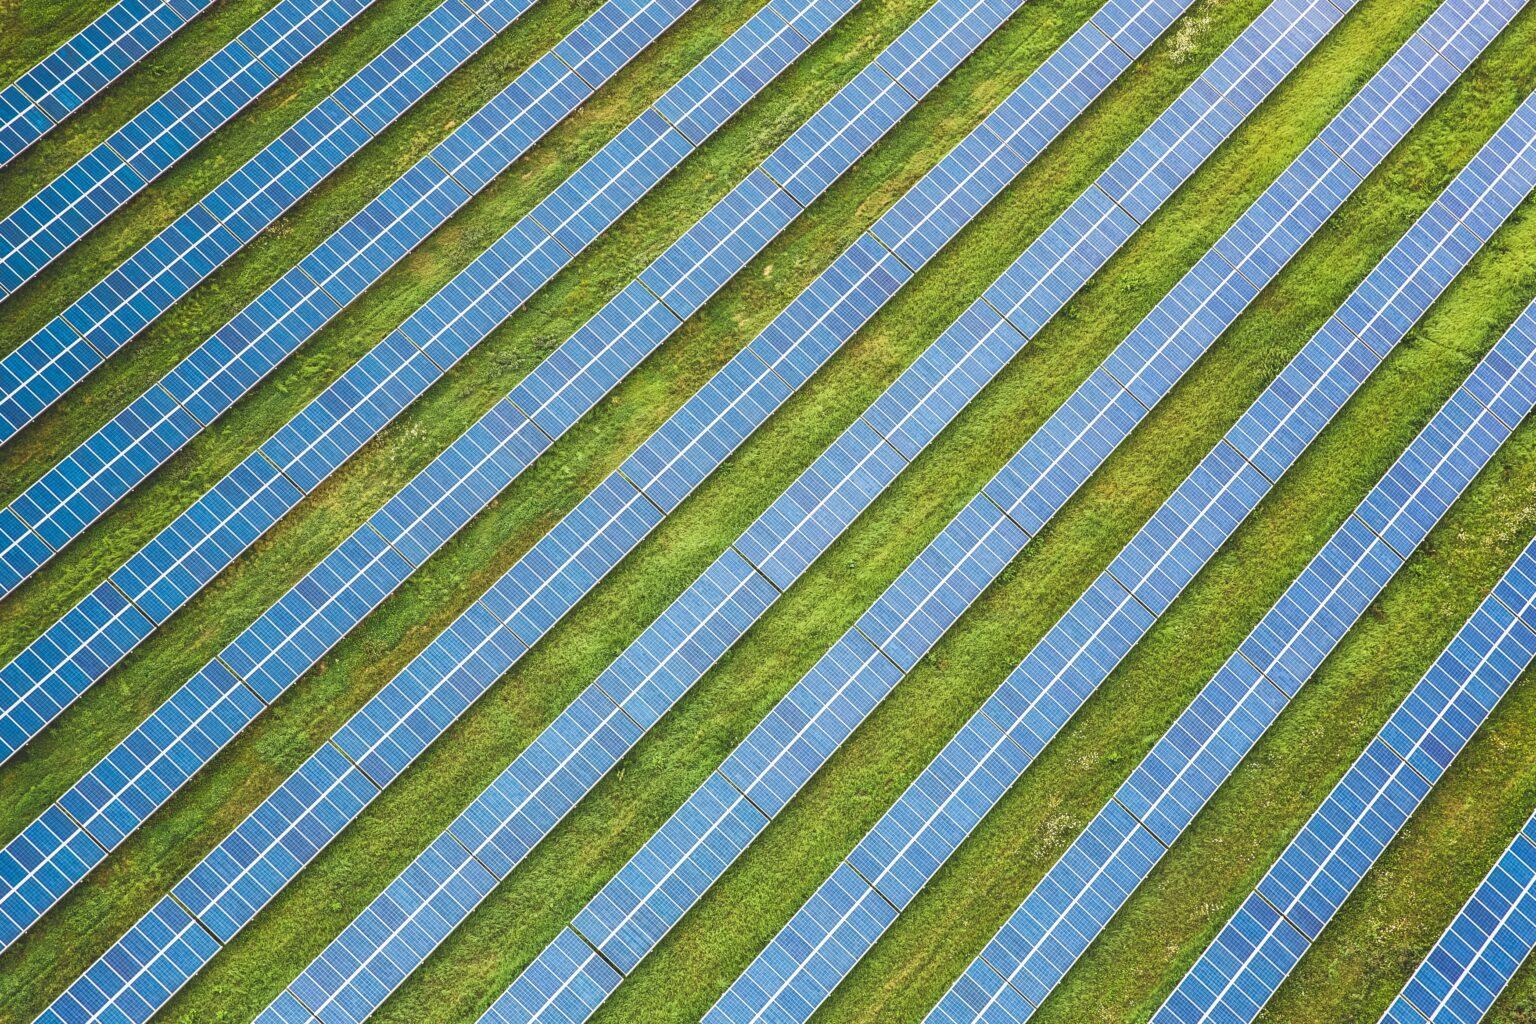 List of 10 solar energy investors in Europe